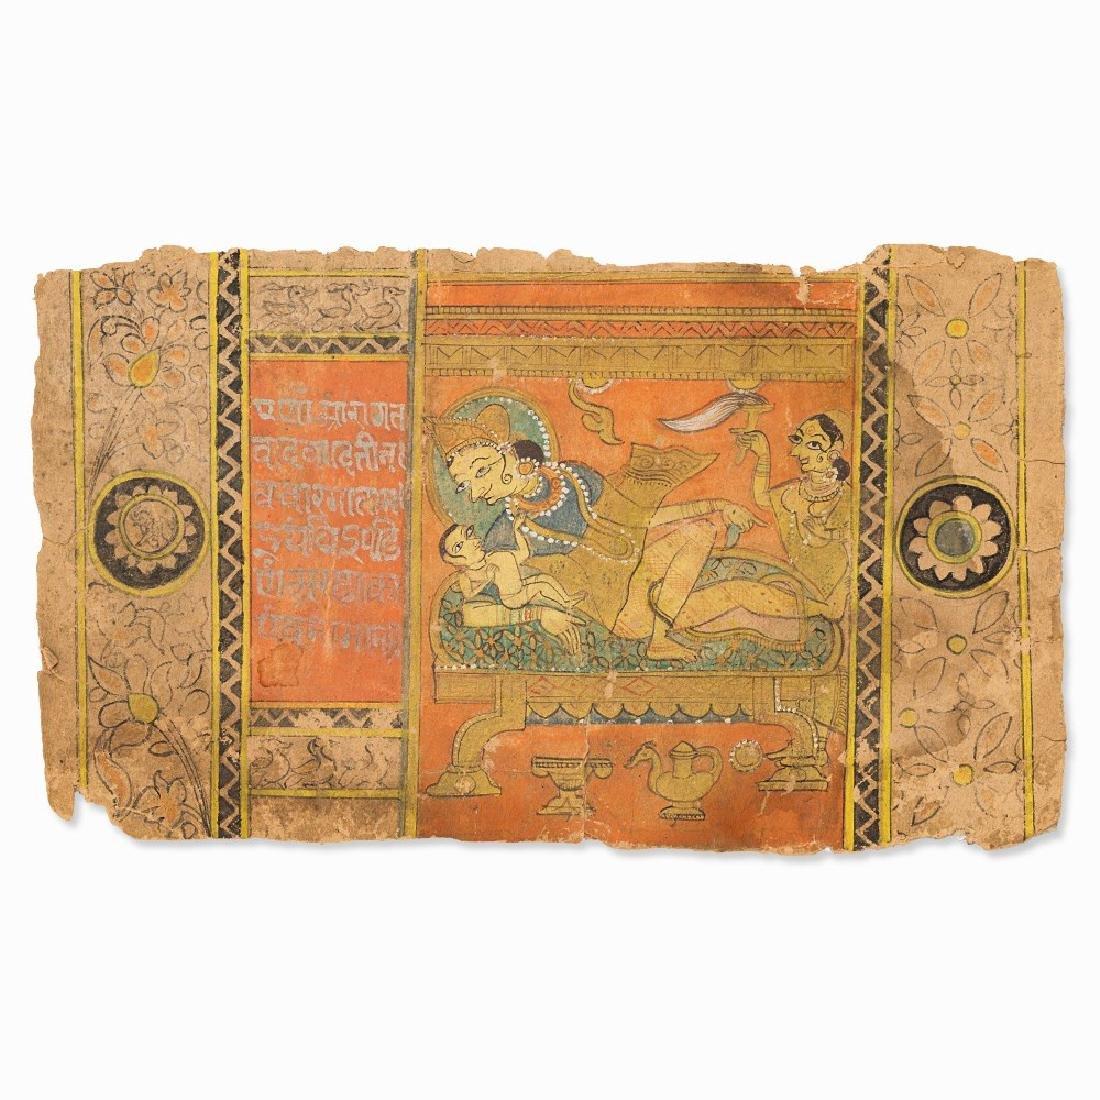 The Birth of Mahavira, West India, Pres. 16th/17th C.